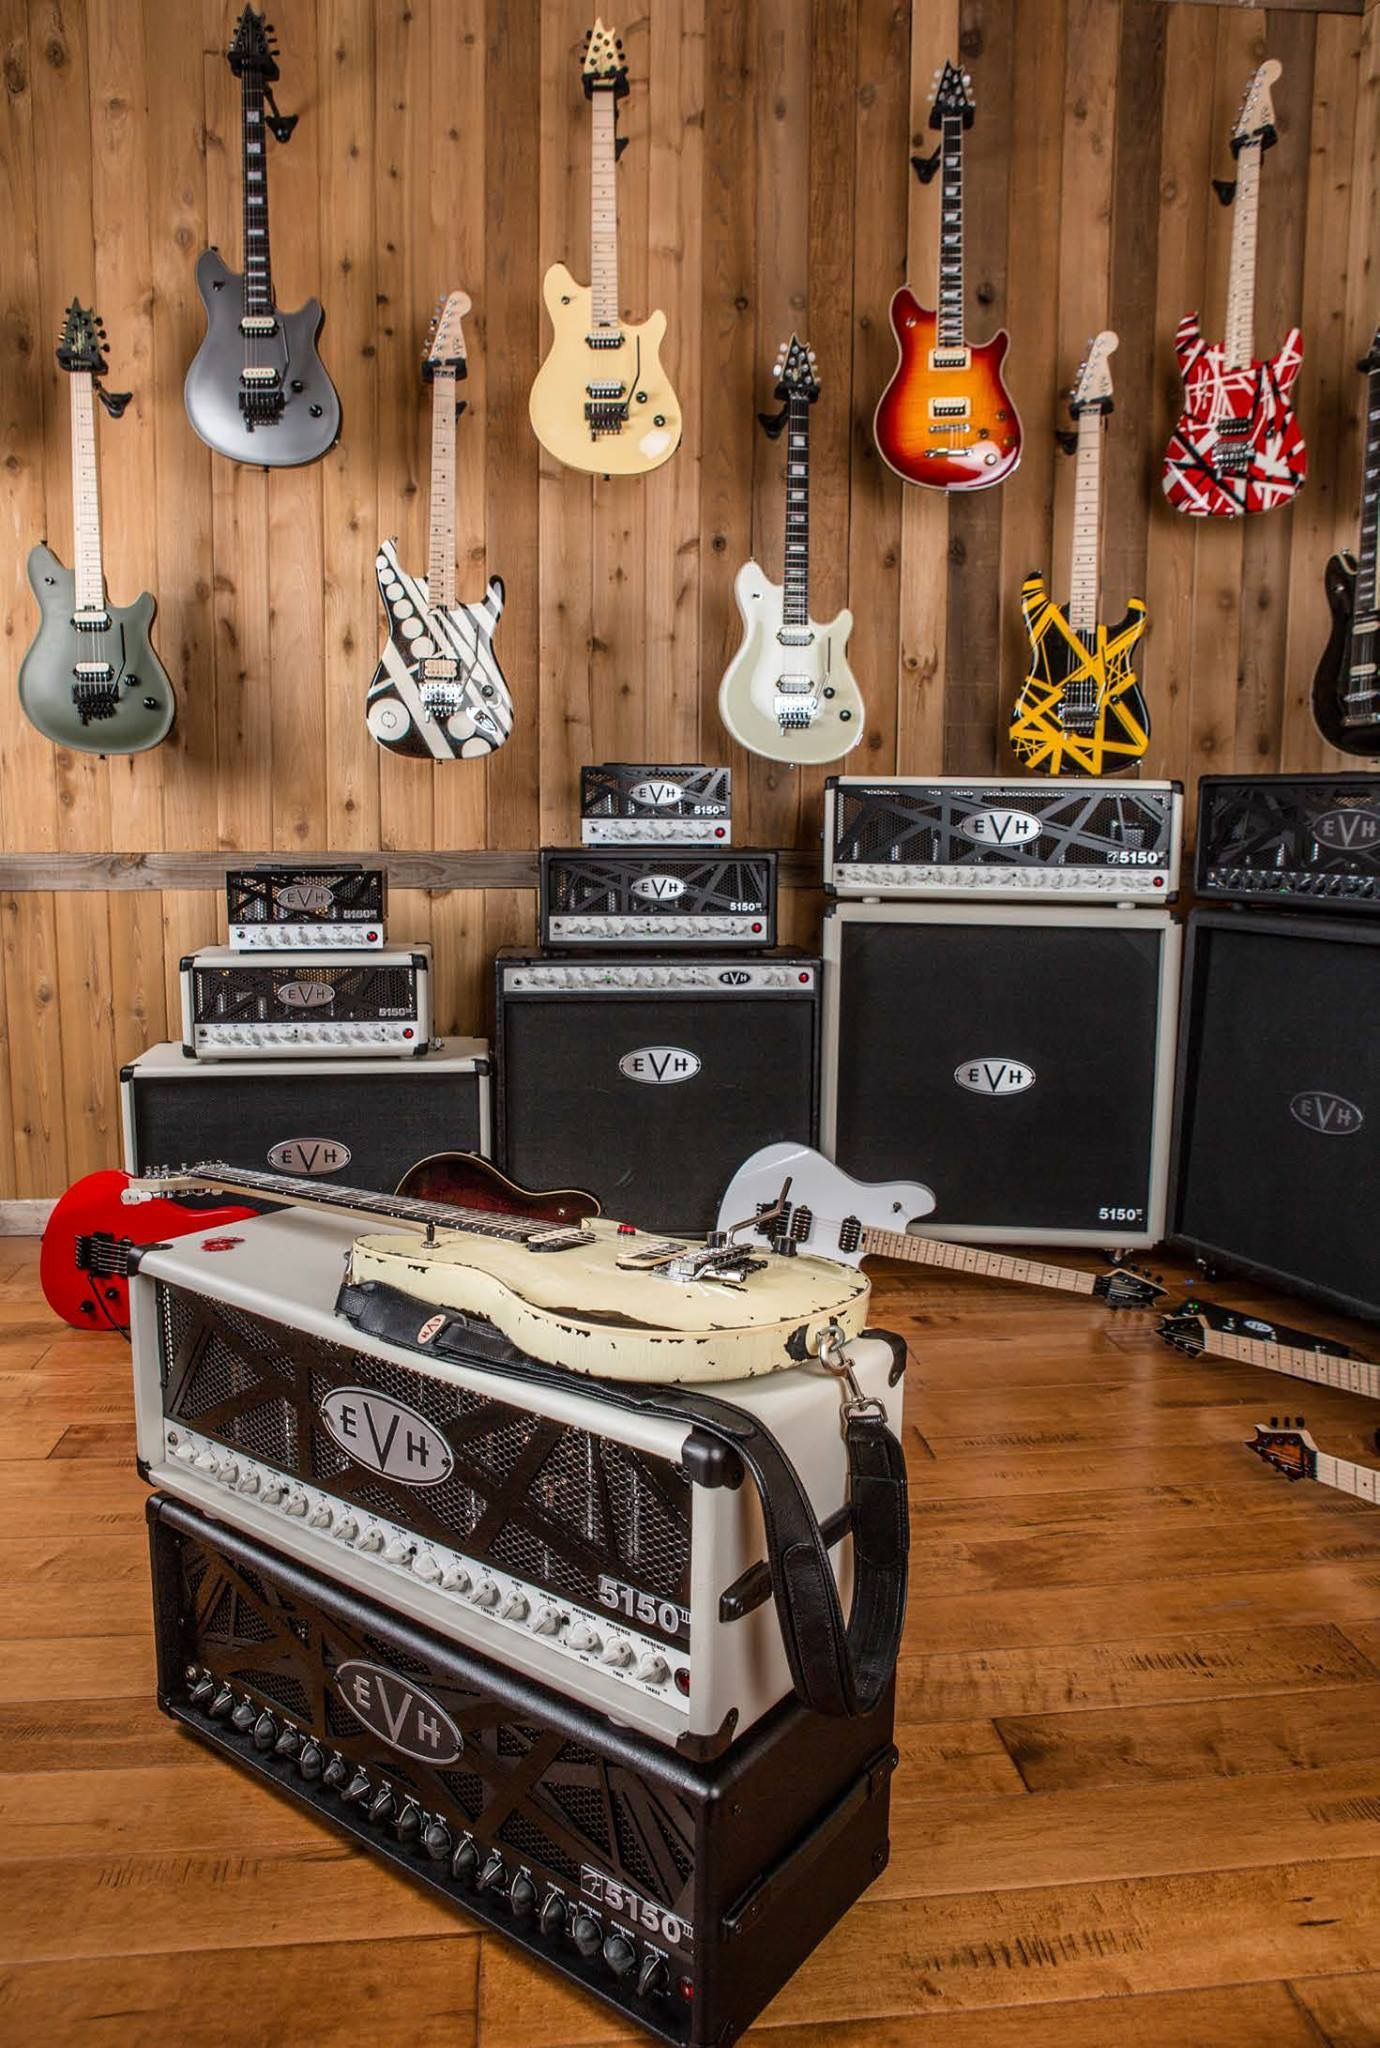 Eddie Van Halen Guitars And Amps Guitar Rig Bass Guitar Eddie Van Halen